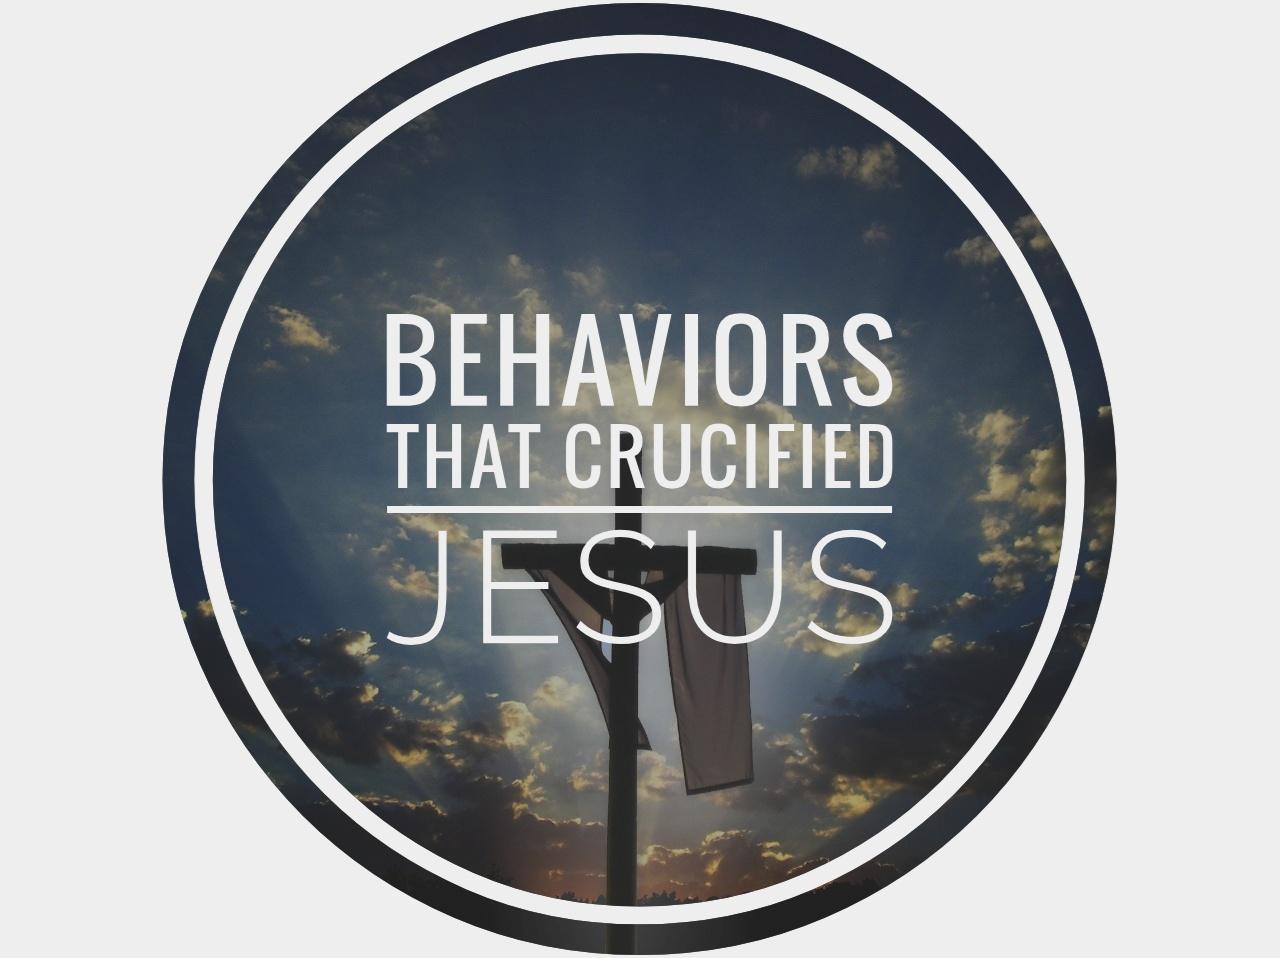 behavior that crucified Jesus 4.15.19.jpeg